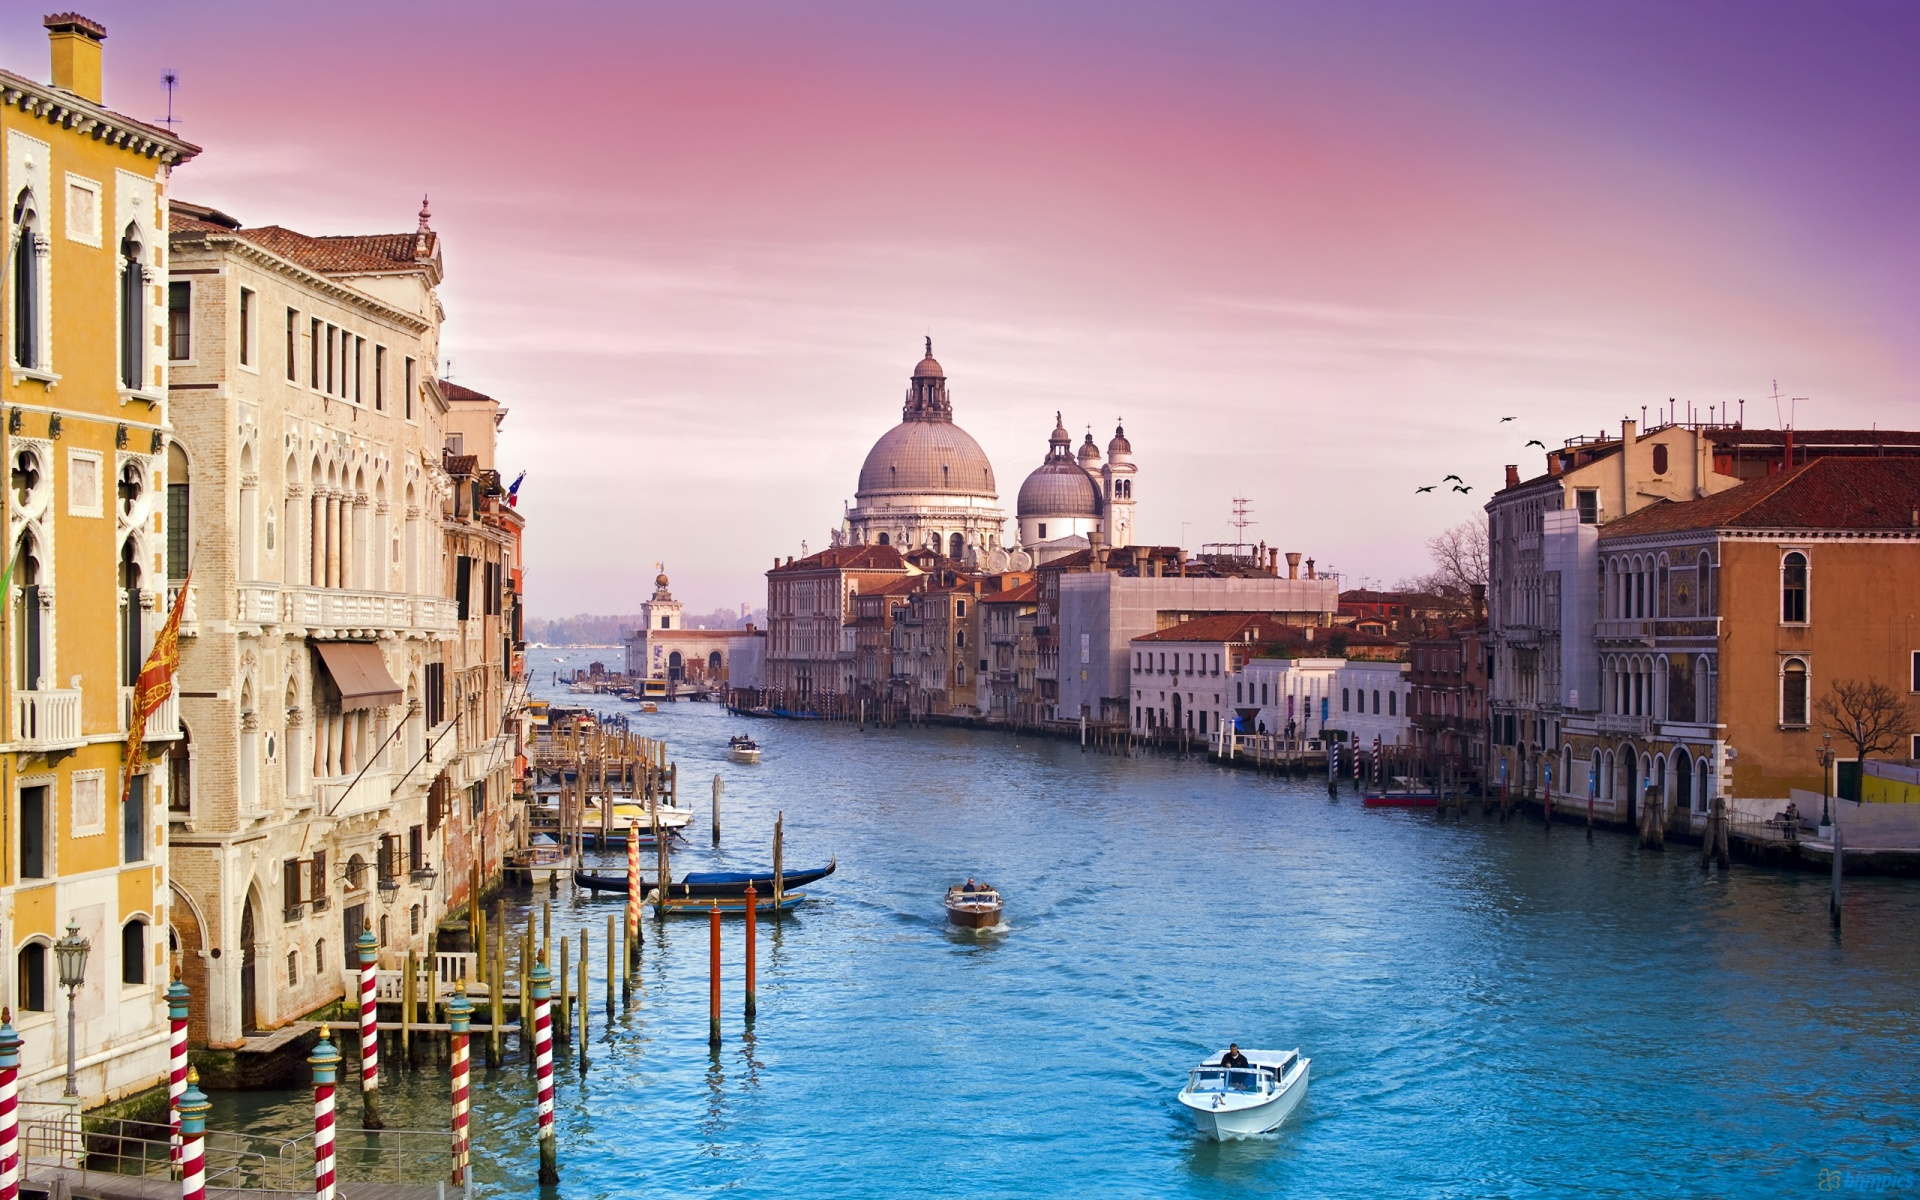 Impressable Venice Italy - Impressable Venice Italy